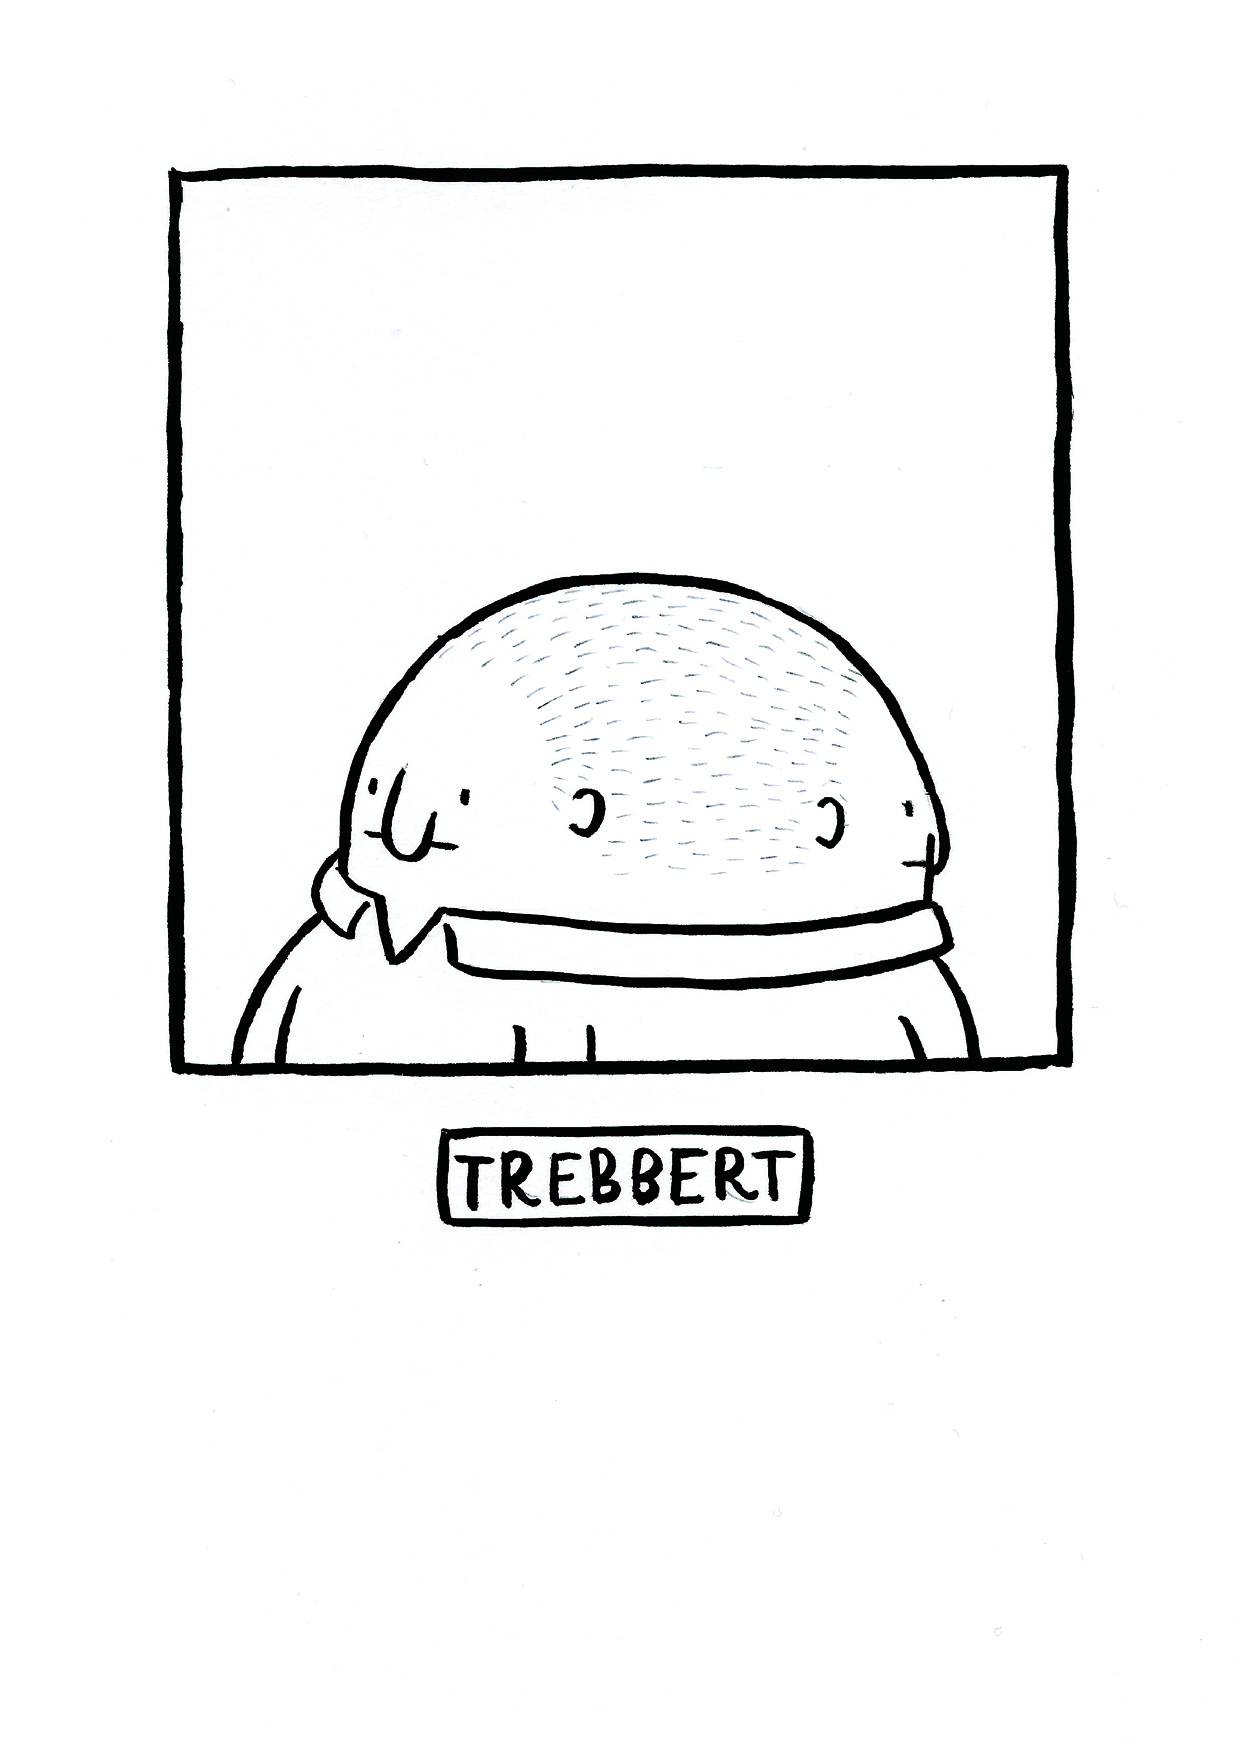 Trebbert